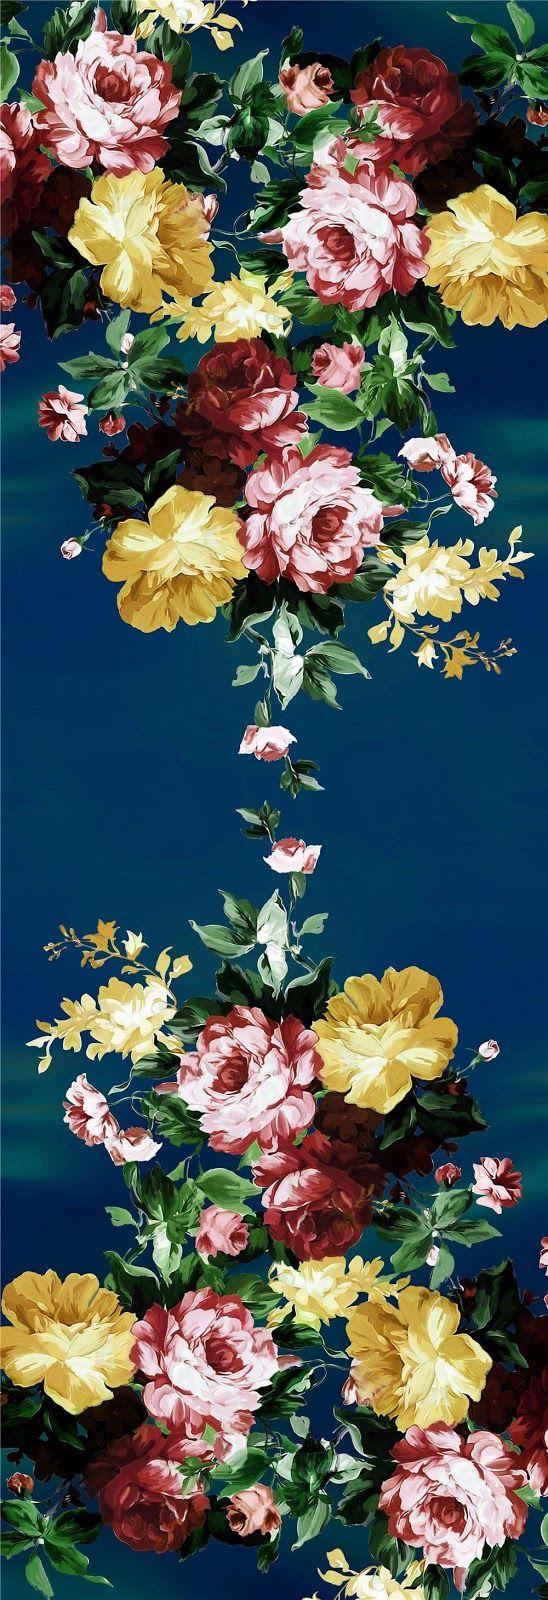 PAINTING_Flower Design_Digital Print_1 | Blisse Design Studio